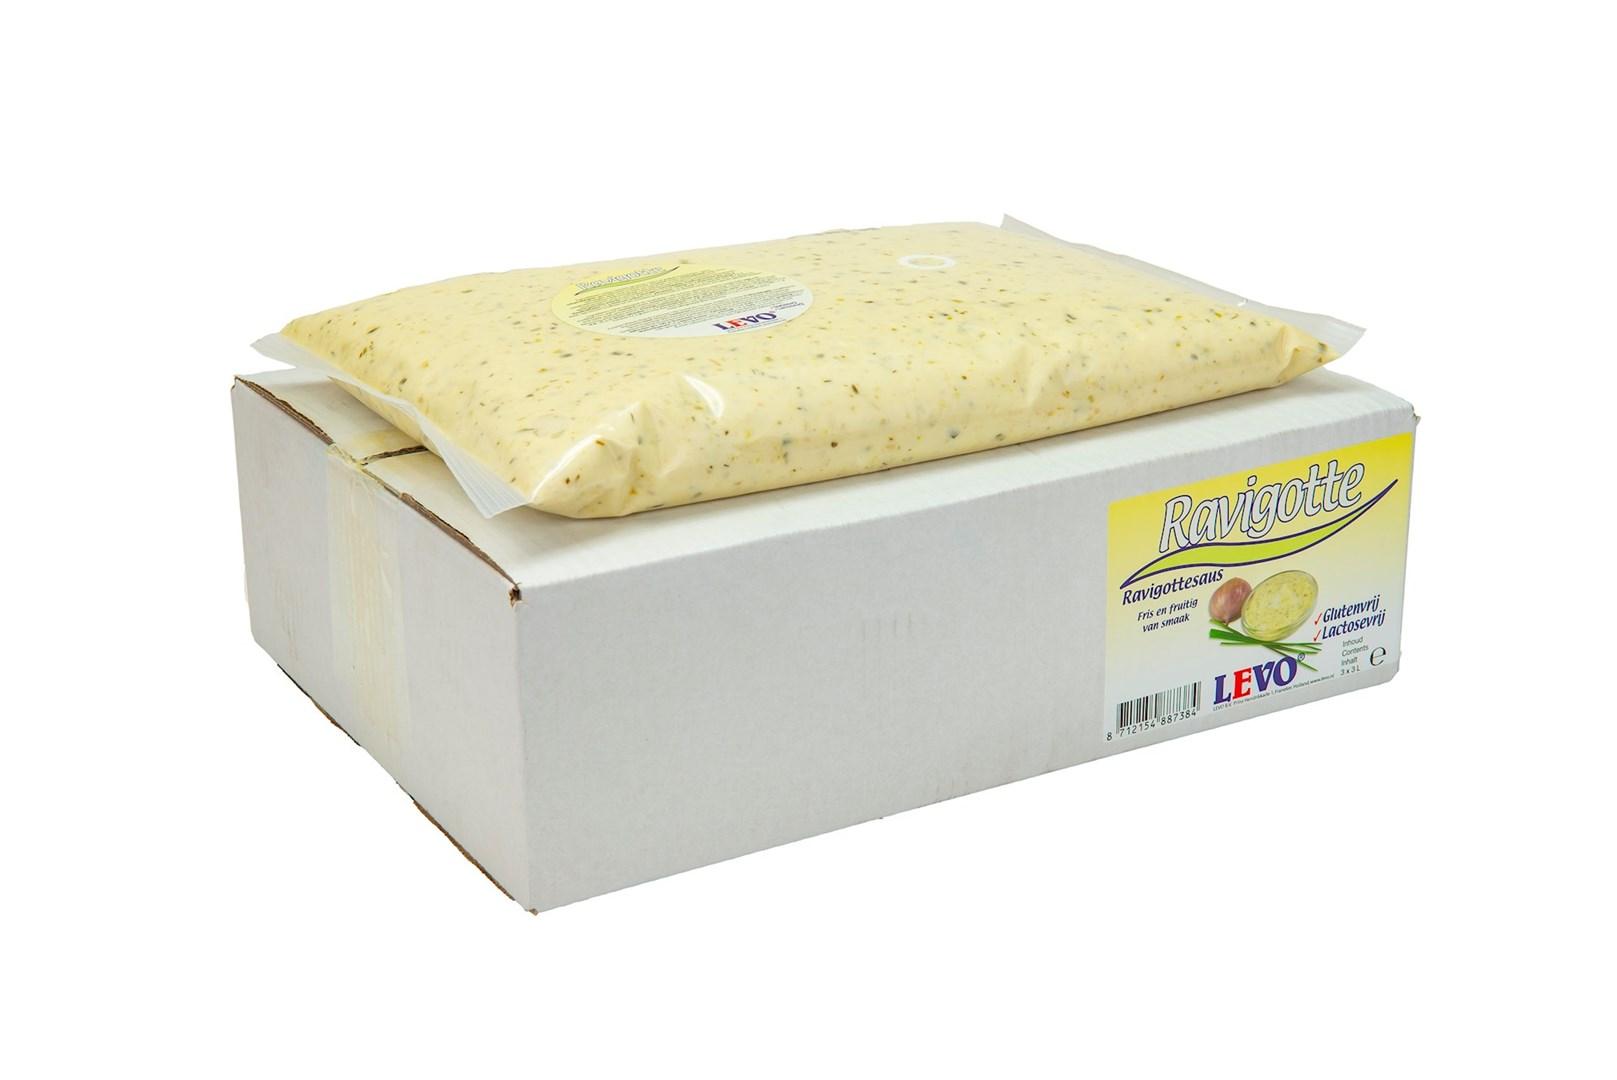 Productafbeelding Ravigottesaus packzak